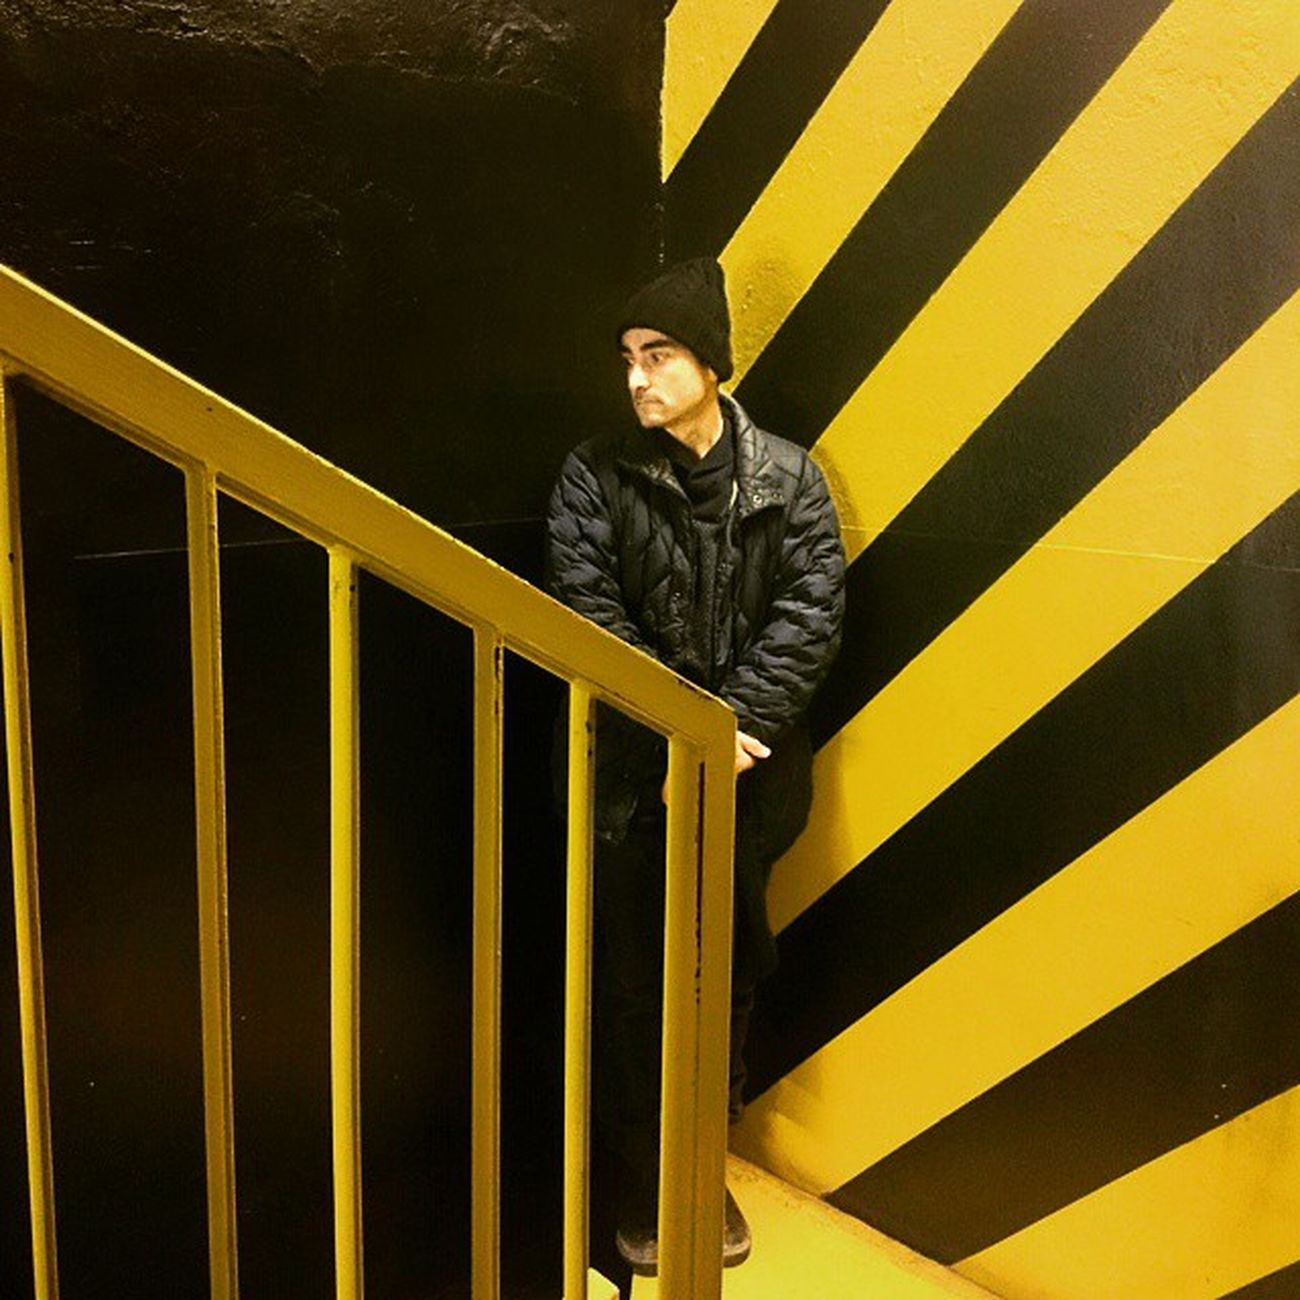 Meet Catufi at Cargo Portrait Yellow Black Stripes Stears Man Giallo Nero Righe Scale  Milan